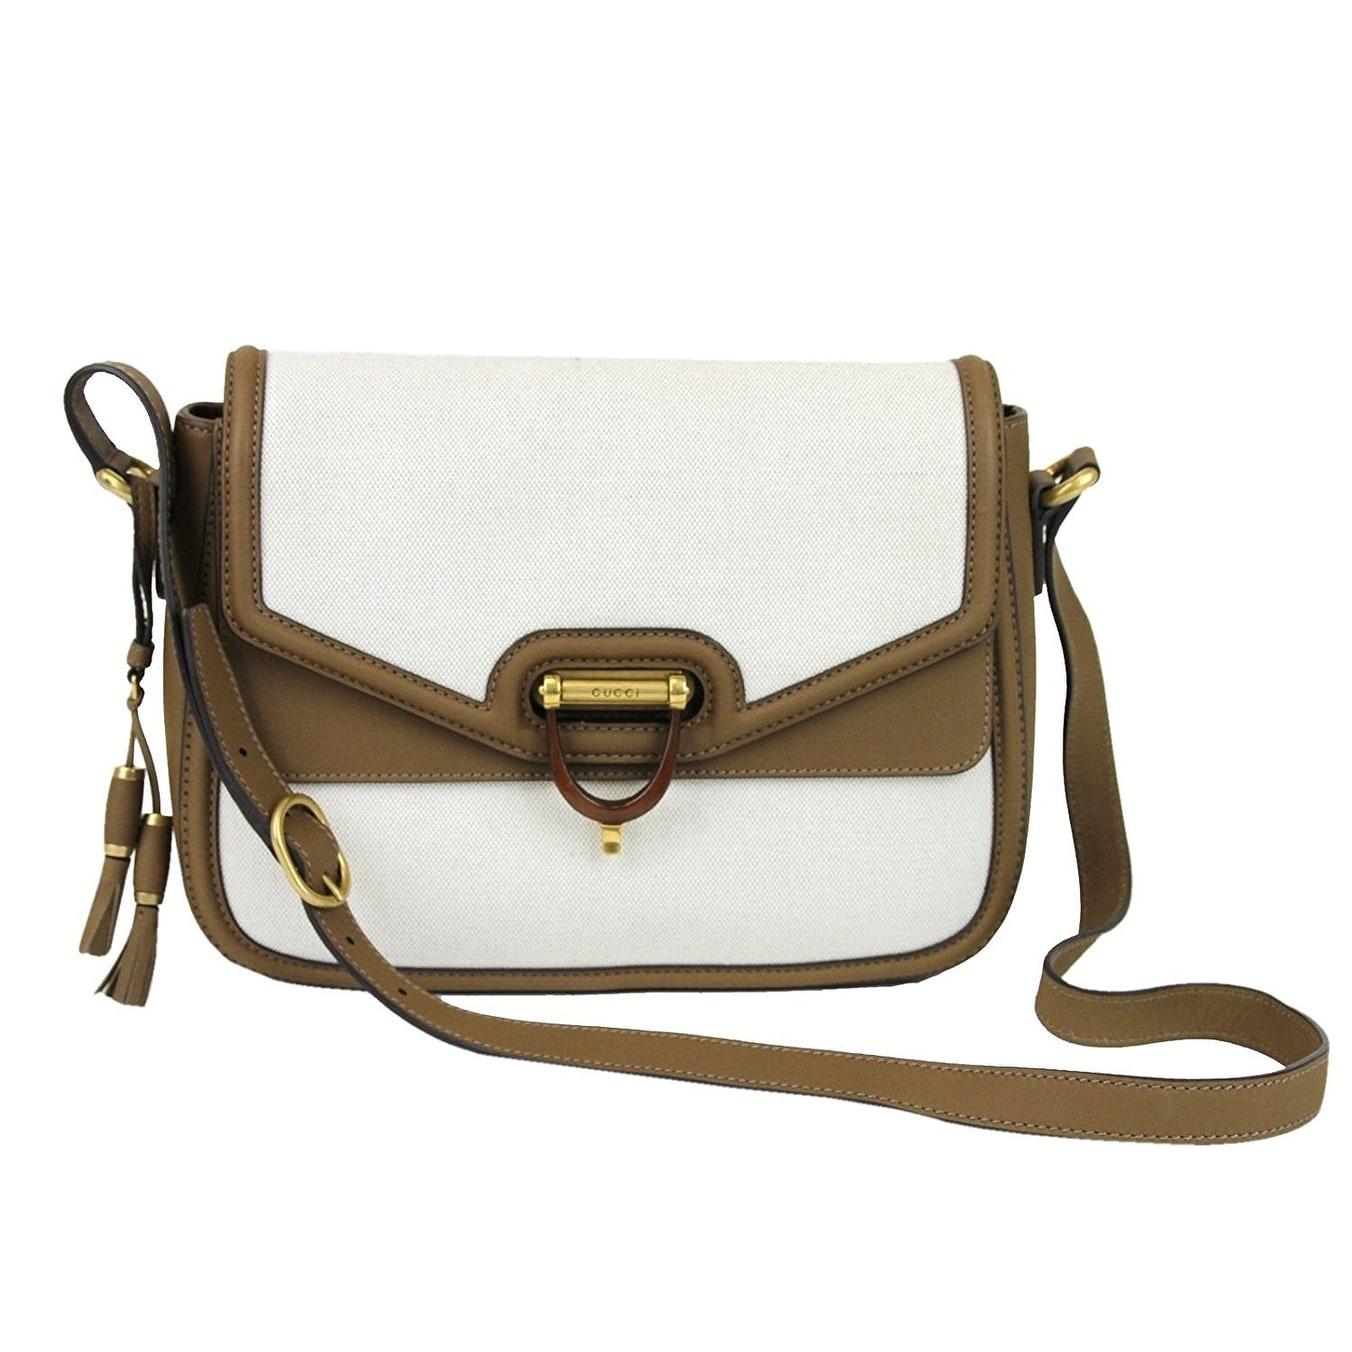 Gucci Women\u0027s White Canvas Derby Messenger Bag 309586 , One size